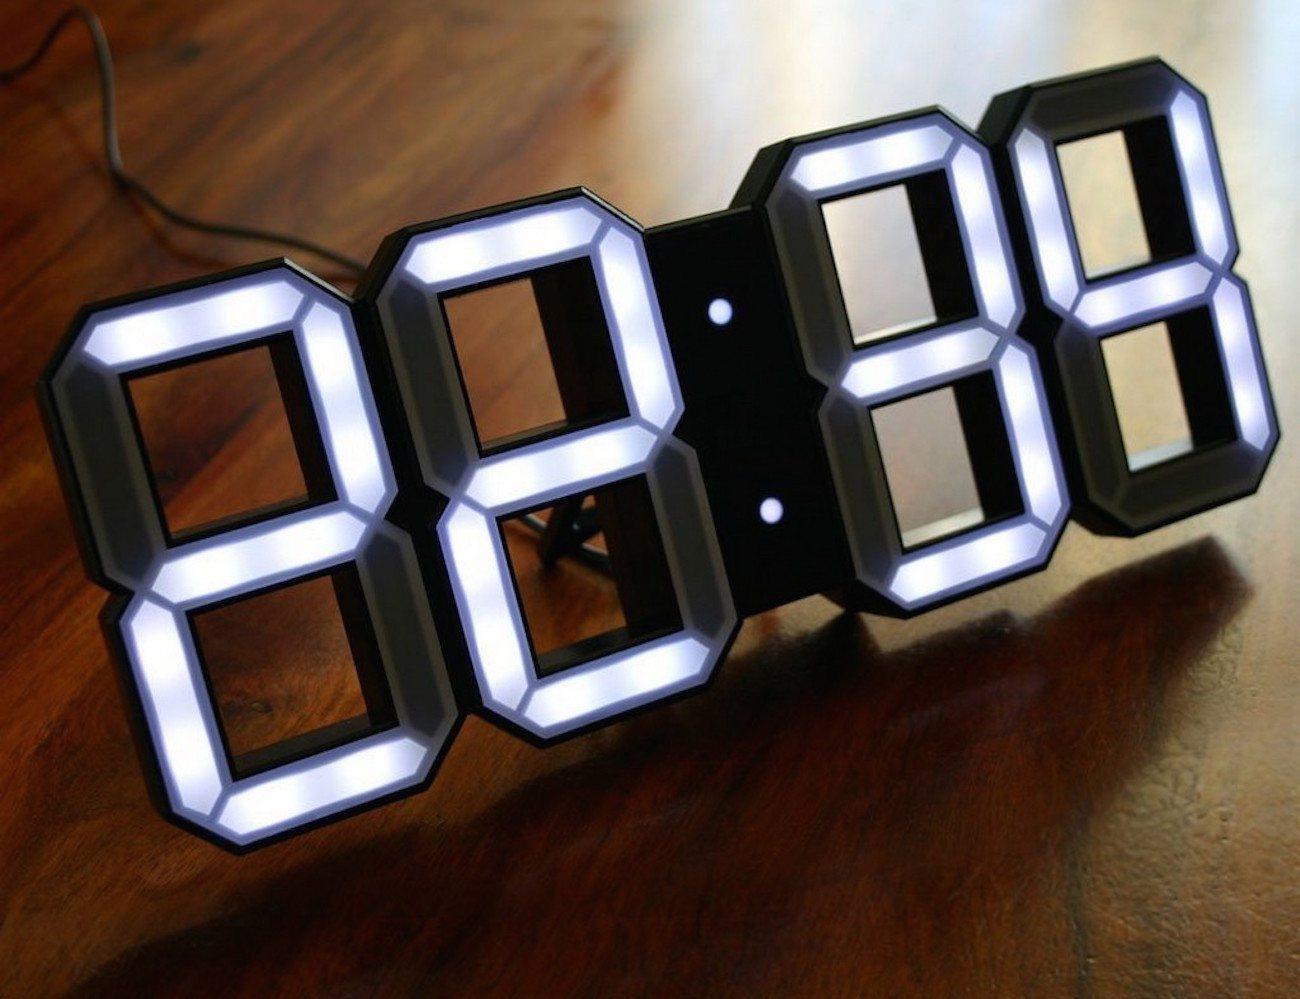 White & White Clock – 3D Digital LED Black Edition Clock